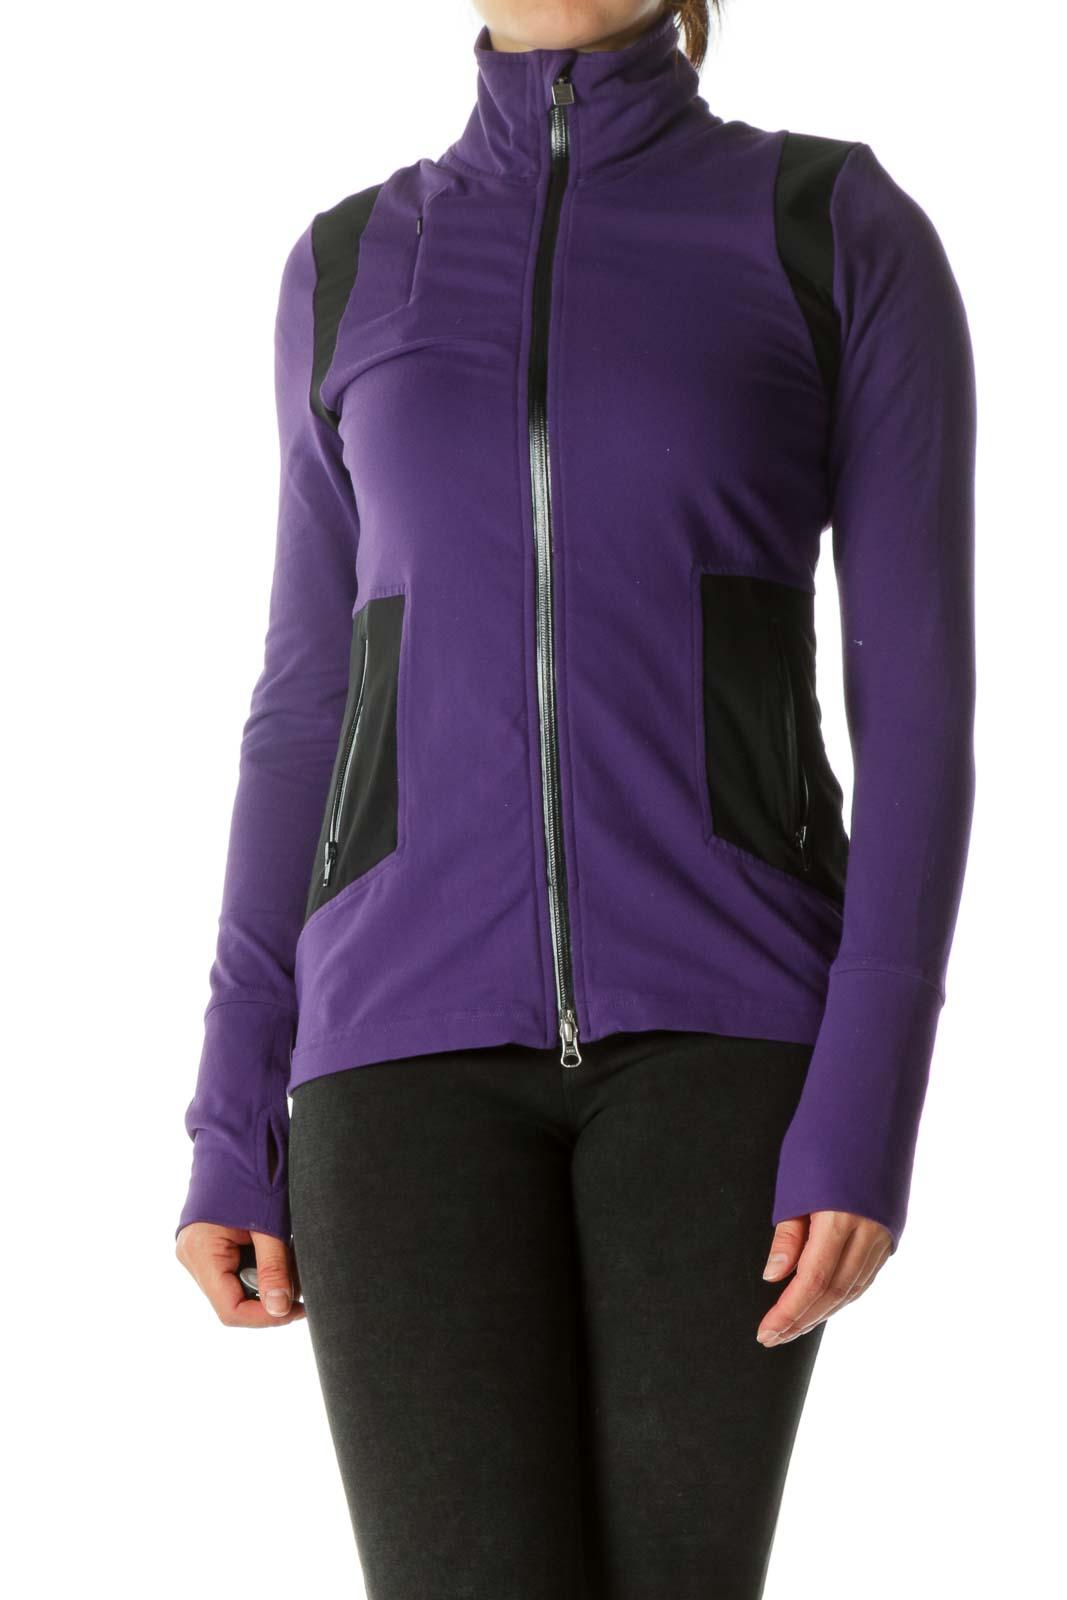 Purple & black Thumb-Holed Double Zippered Sports Jackets Front